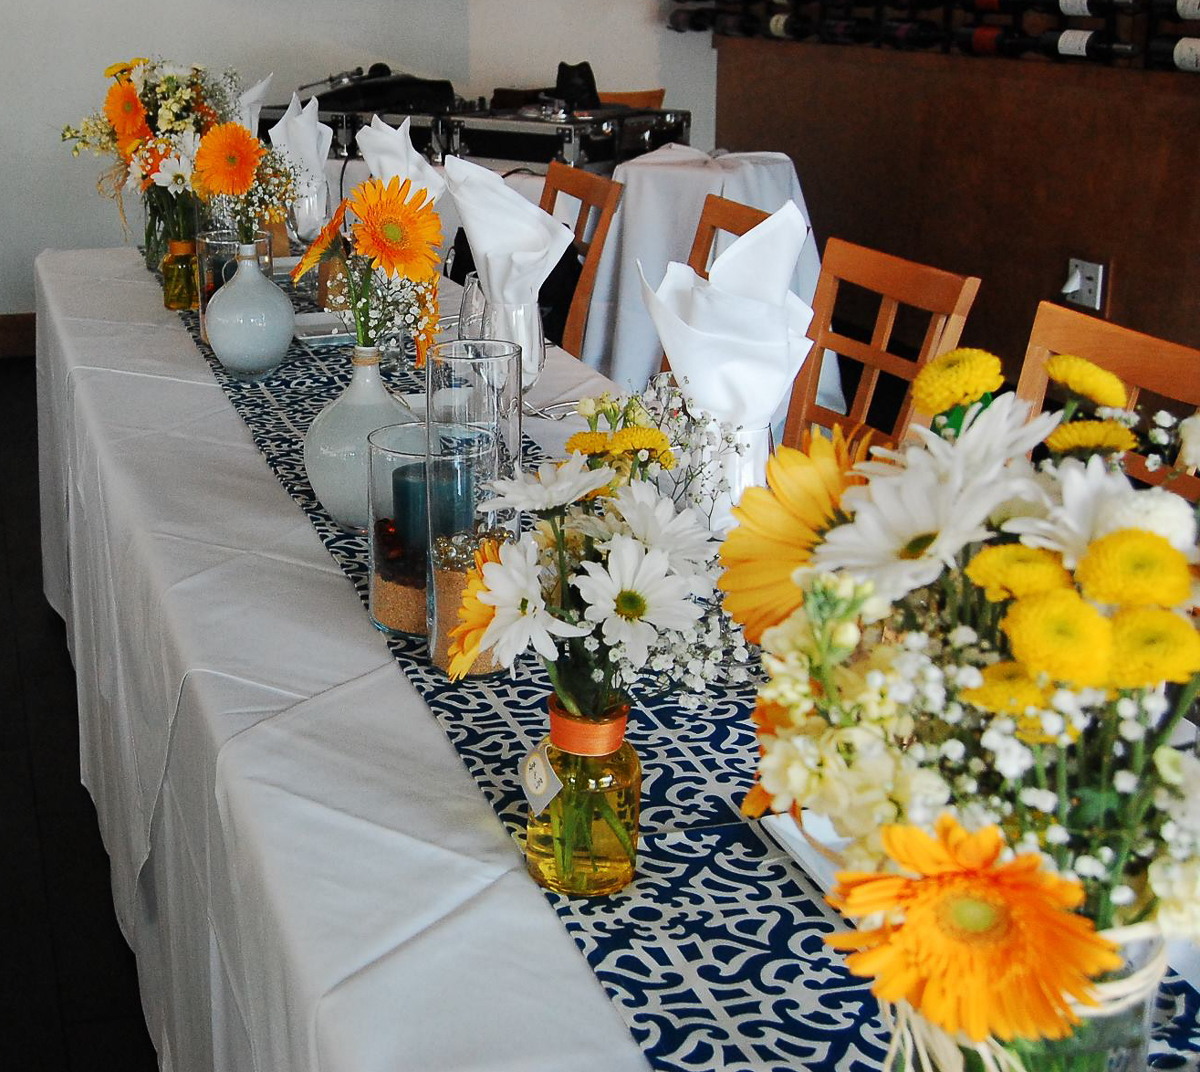 CARMENS_floral_designs_wedding_flowers_houston_031.JPG